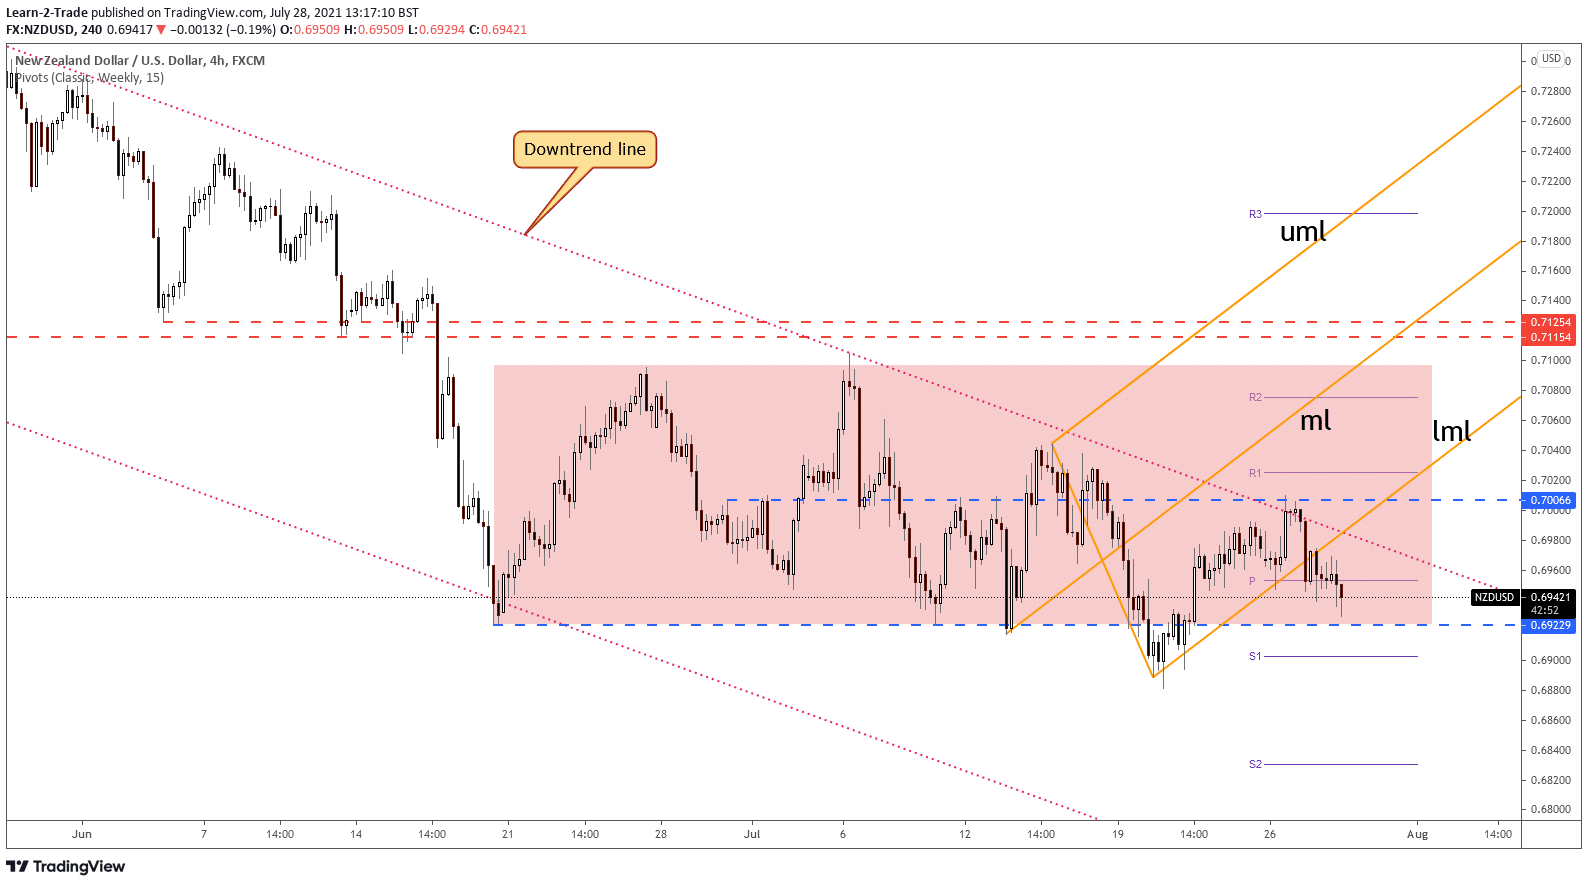 NZD/USD 4-hour price chart forecast